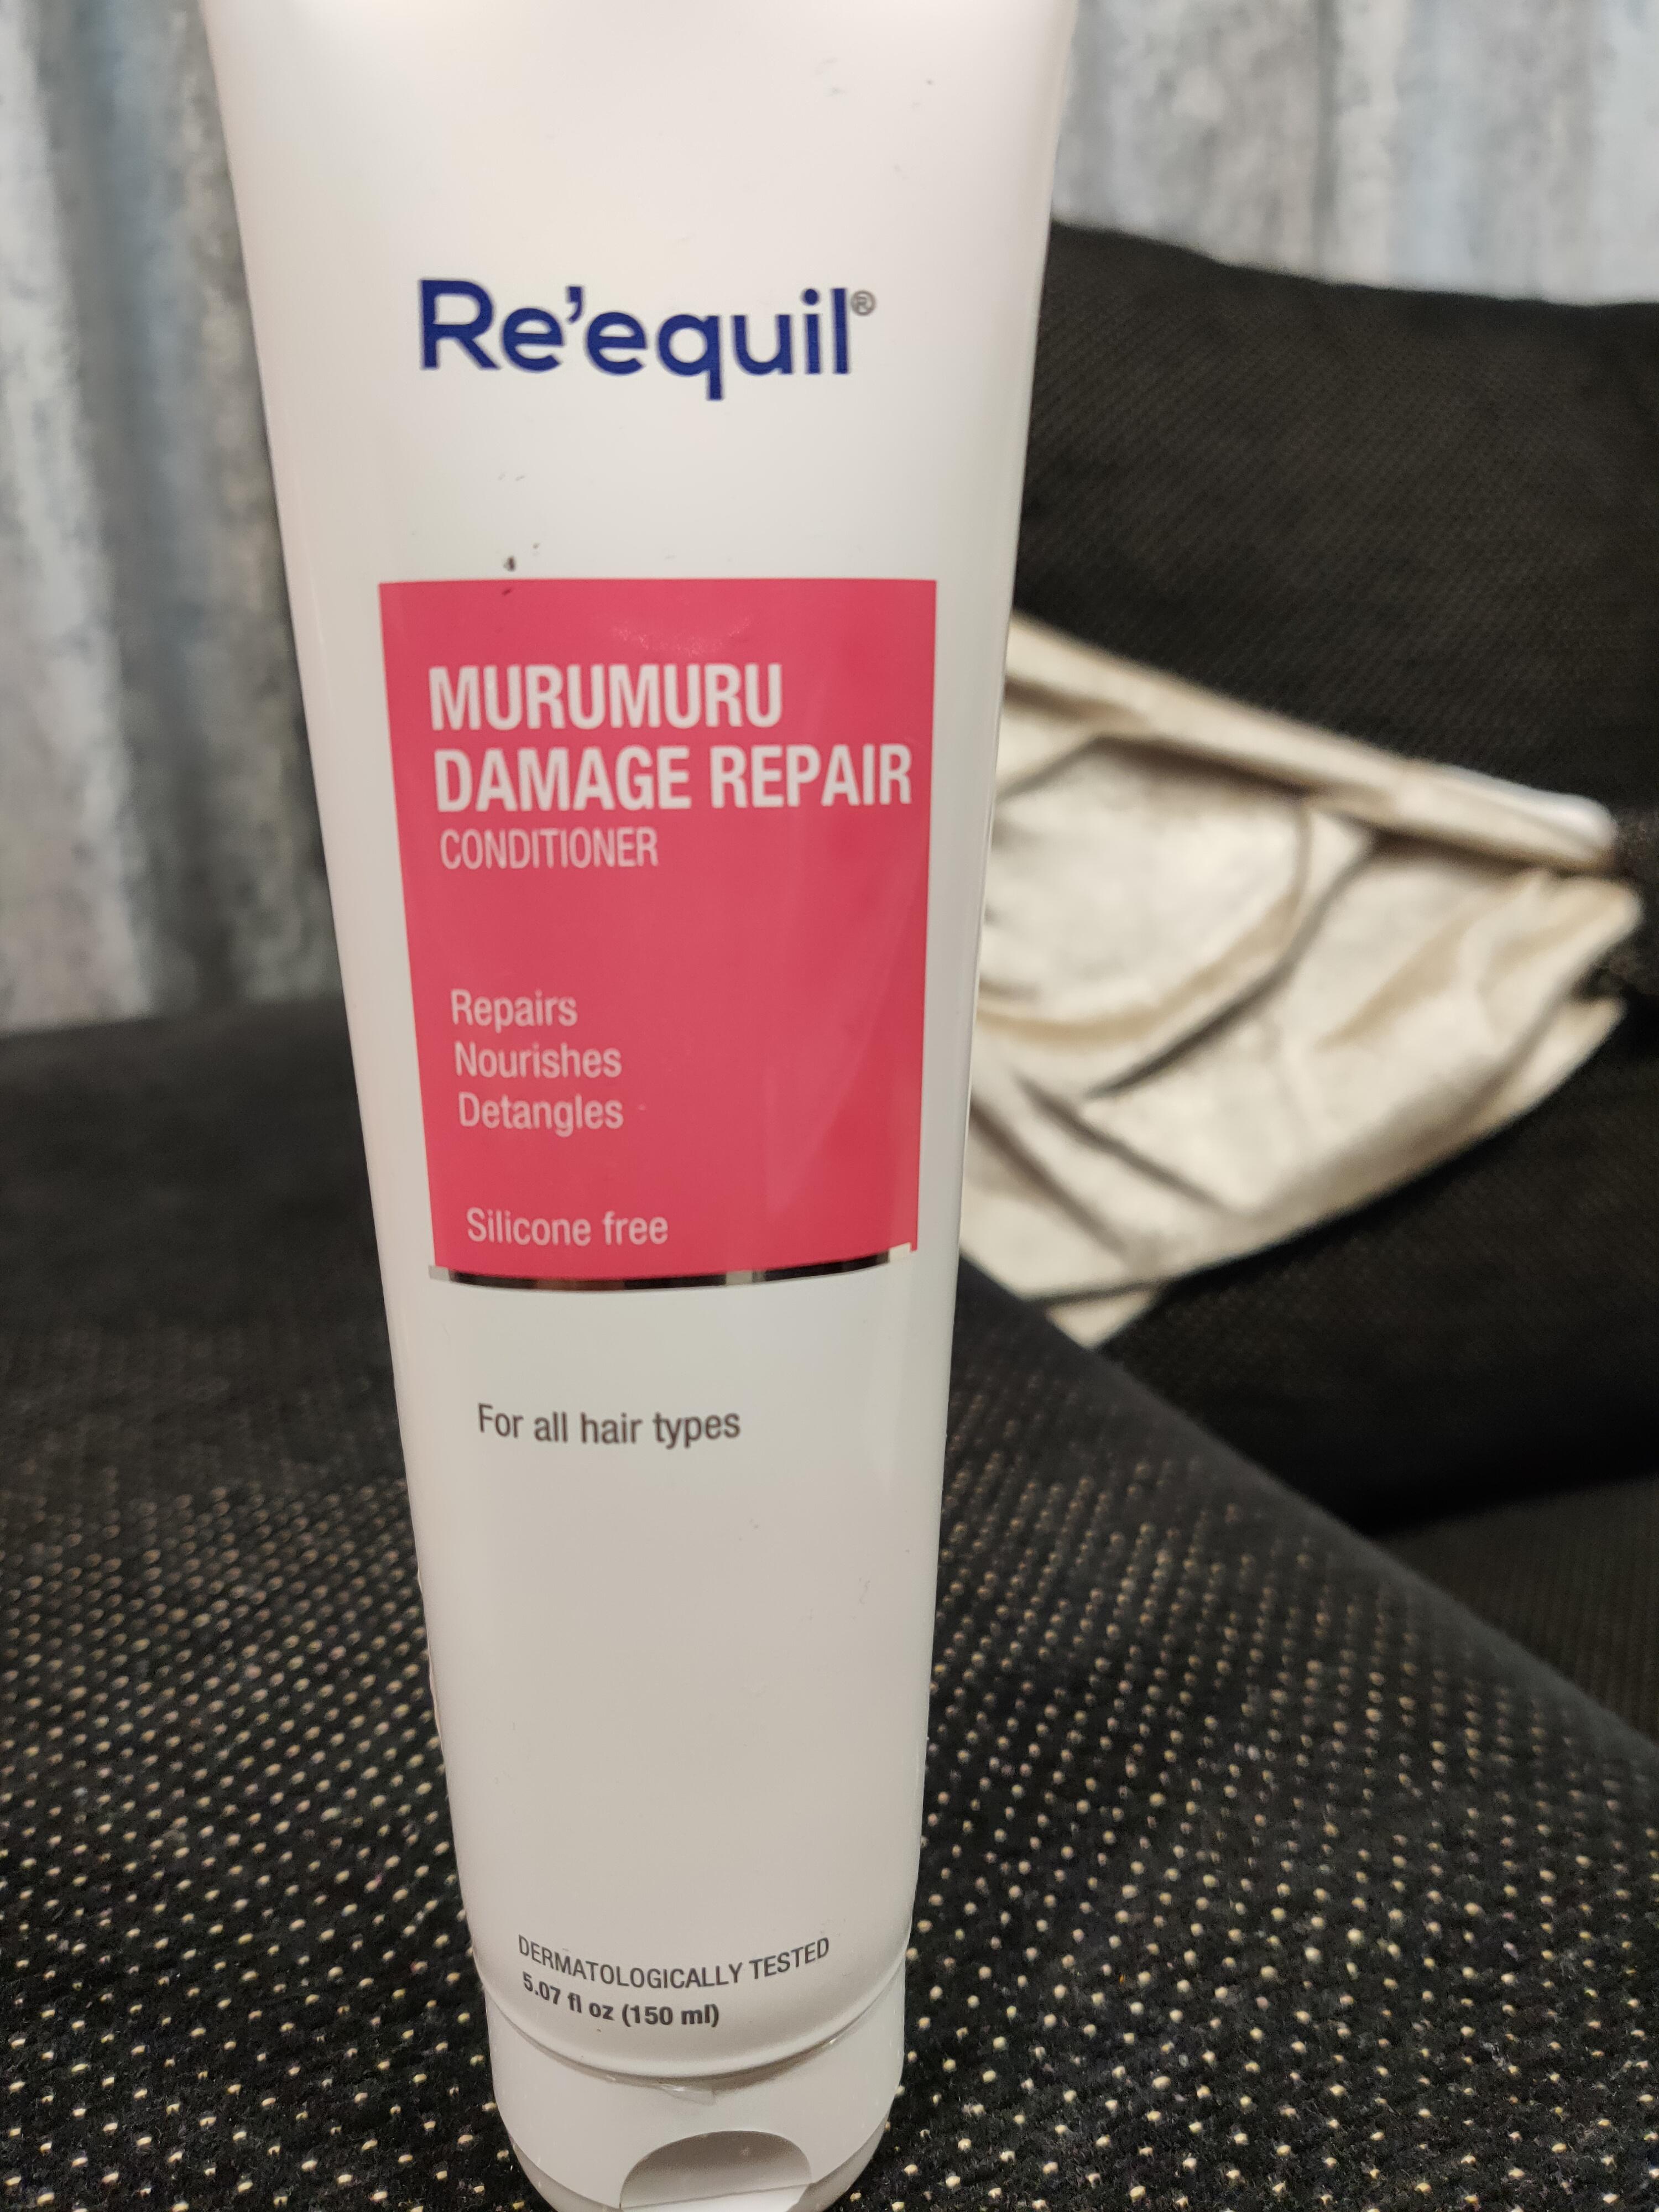 Re'equil Murumuru Damage Repair Conditioner -Best for damaged hair-By suhanigaba